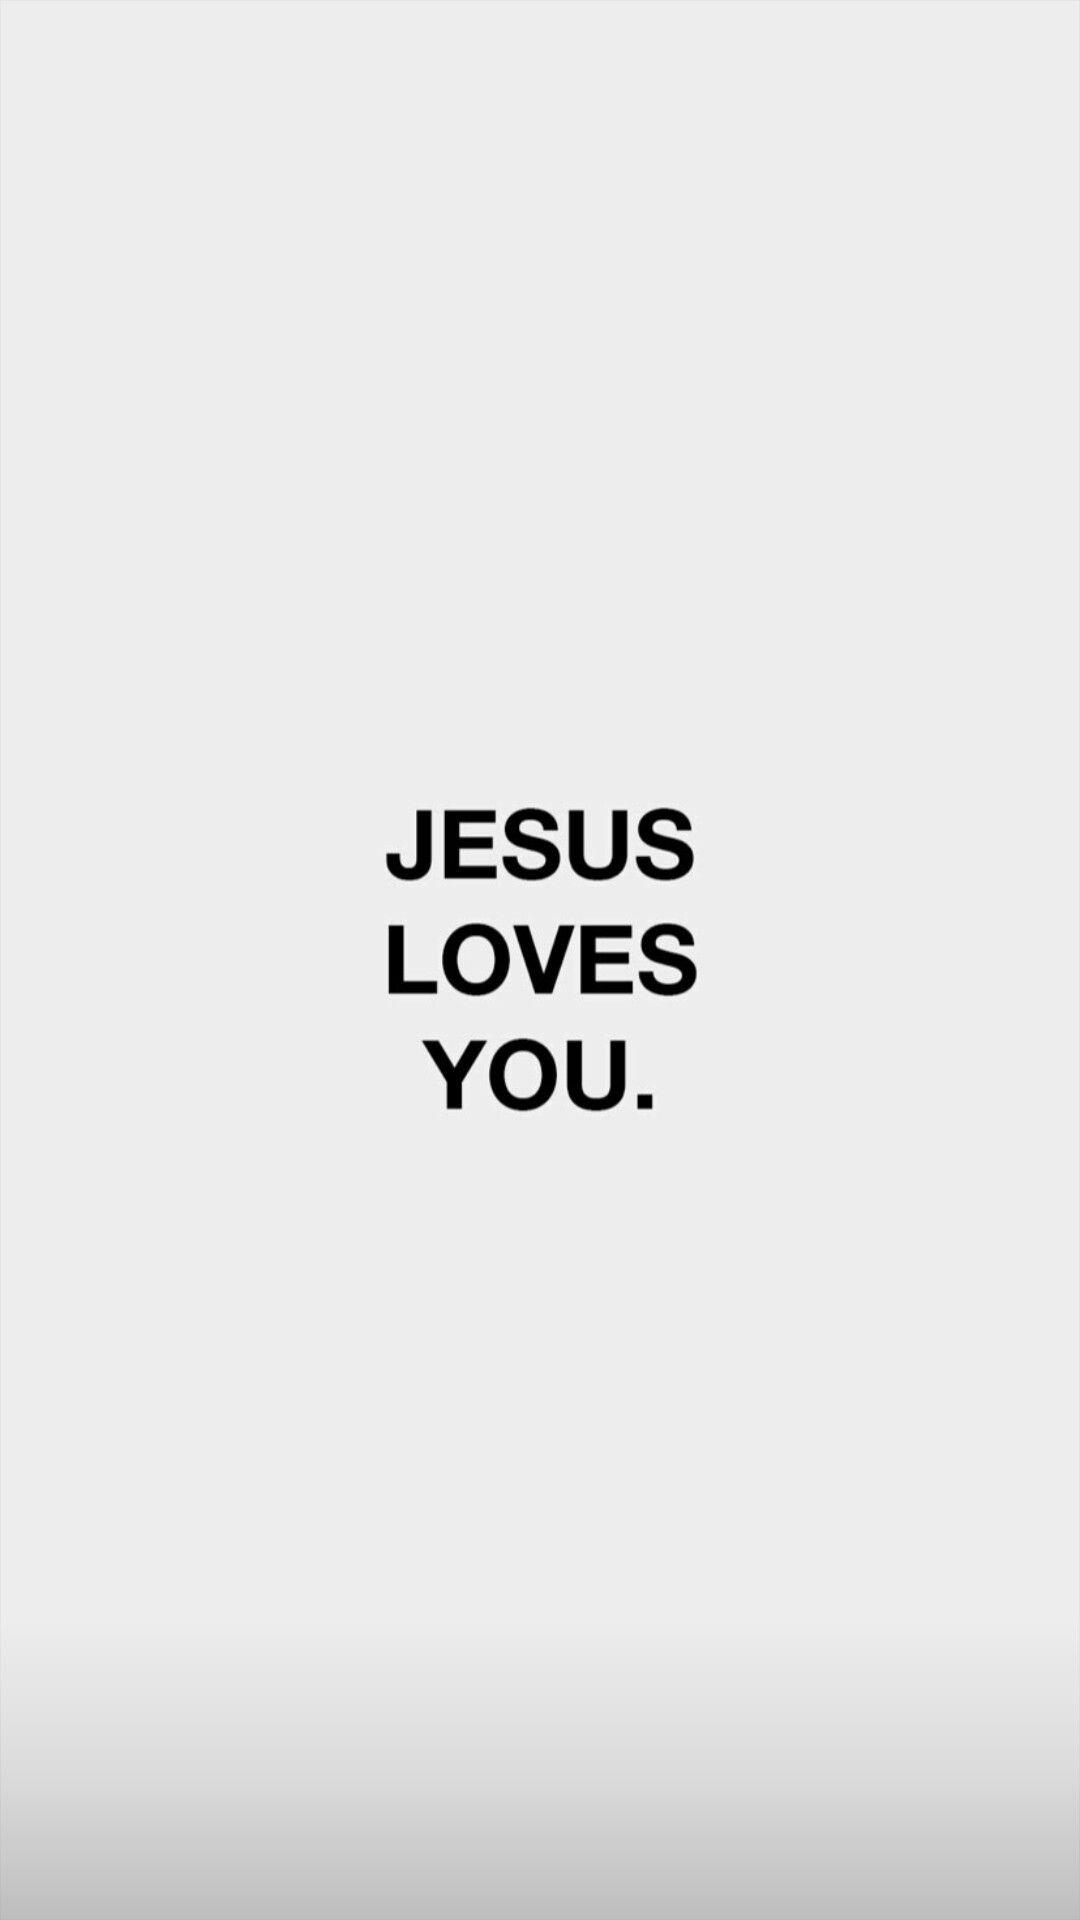 Jesus Loves You Co Wallpaper Jesus Christian Wallpaper Prayer Quotes